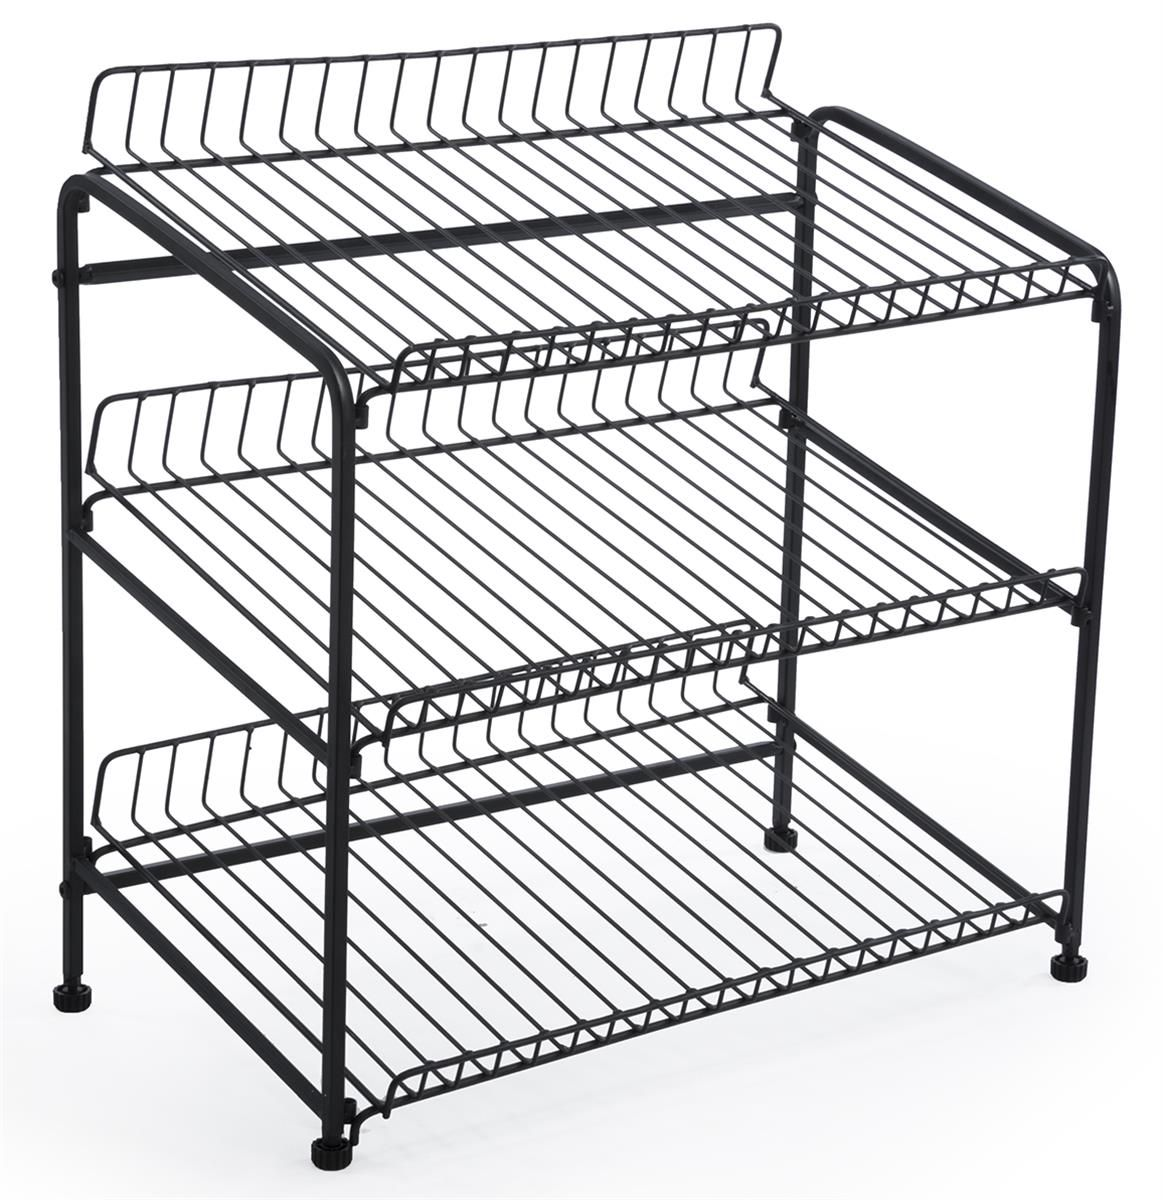 Wire countertop display rack